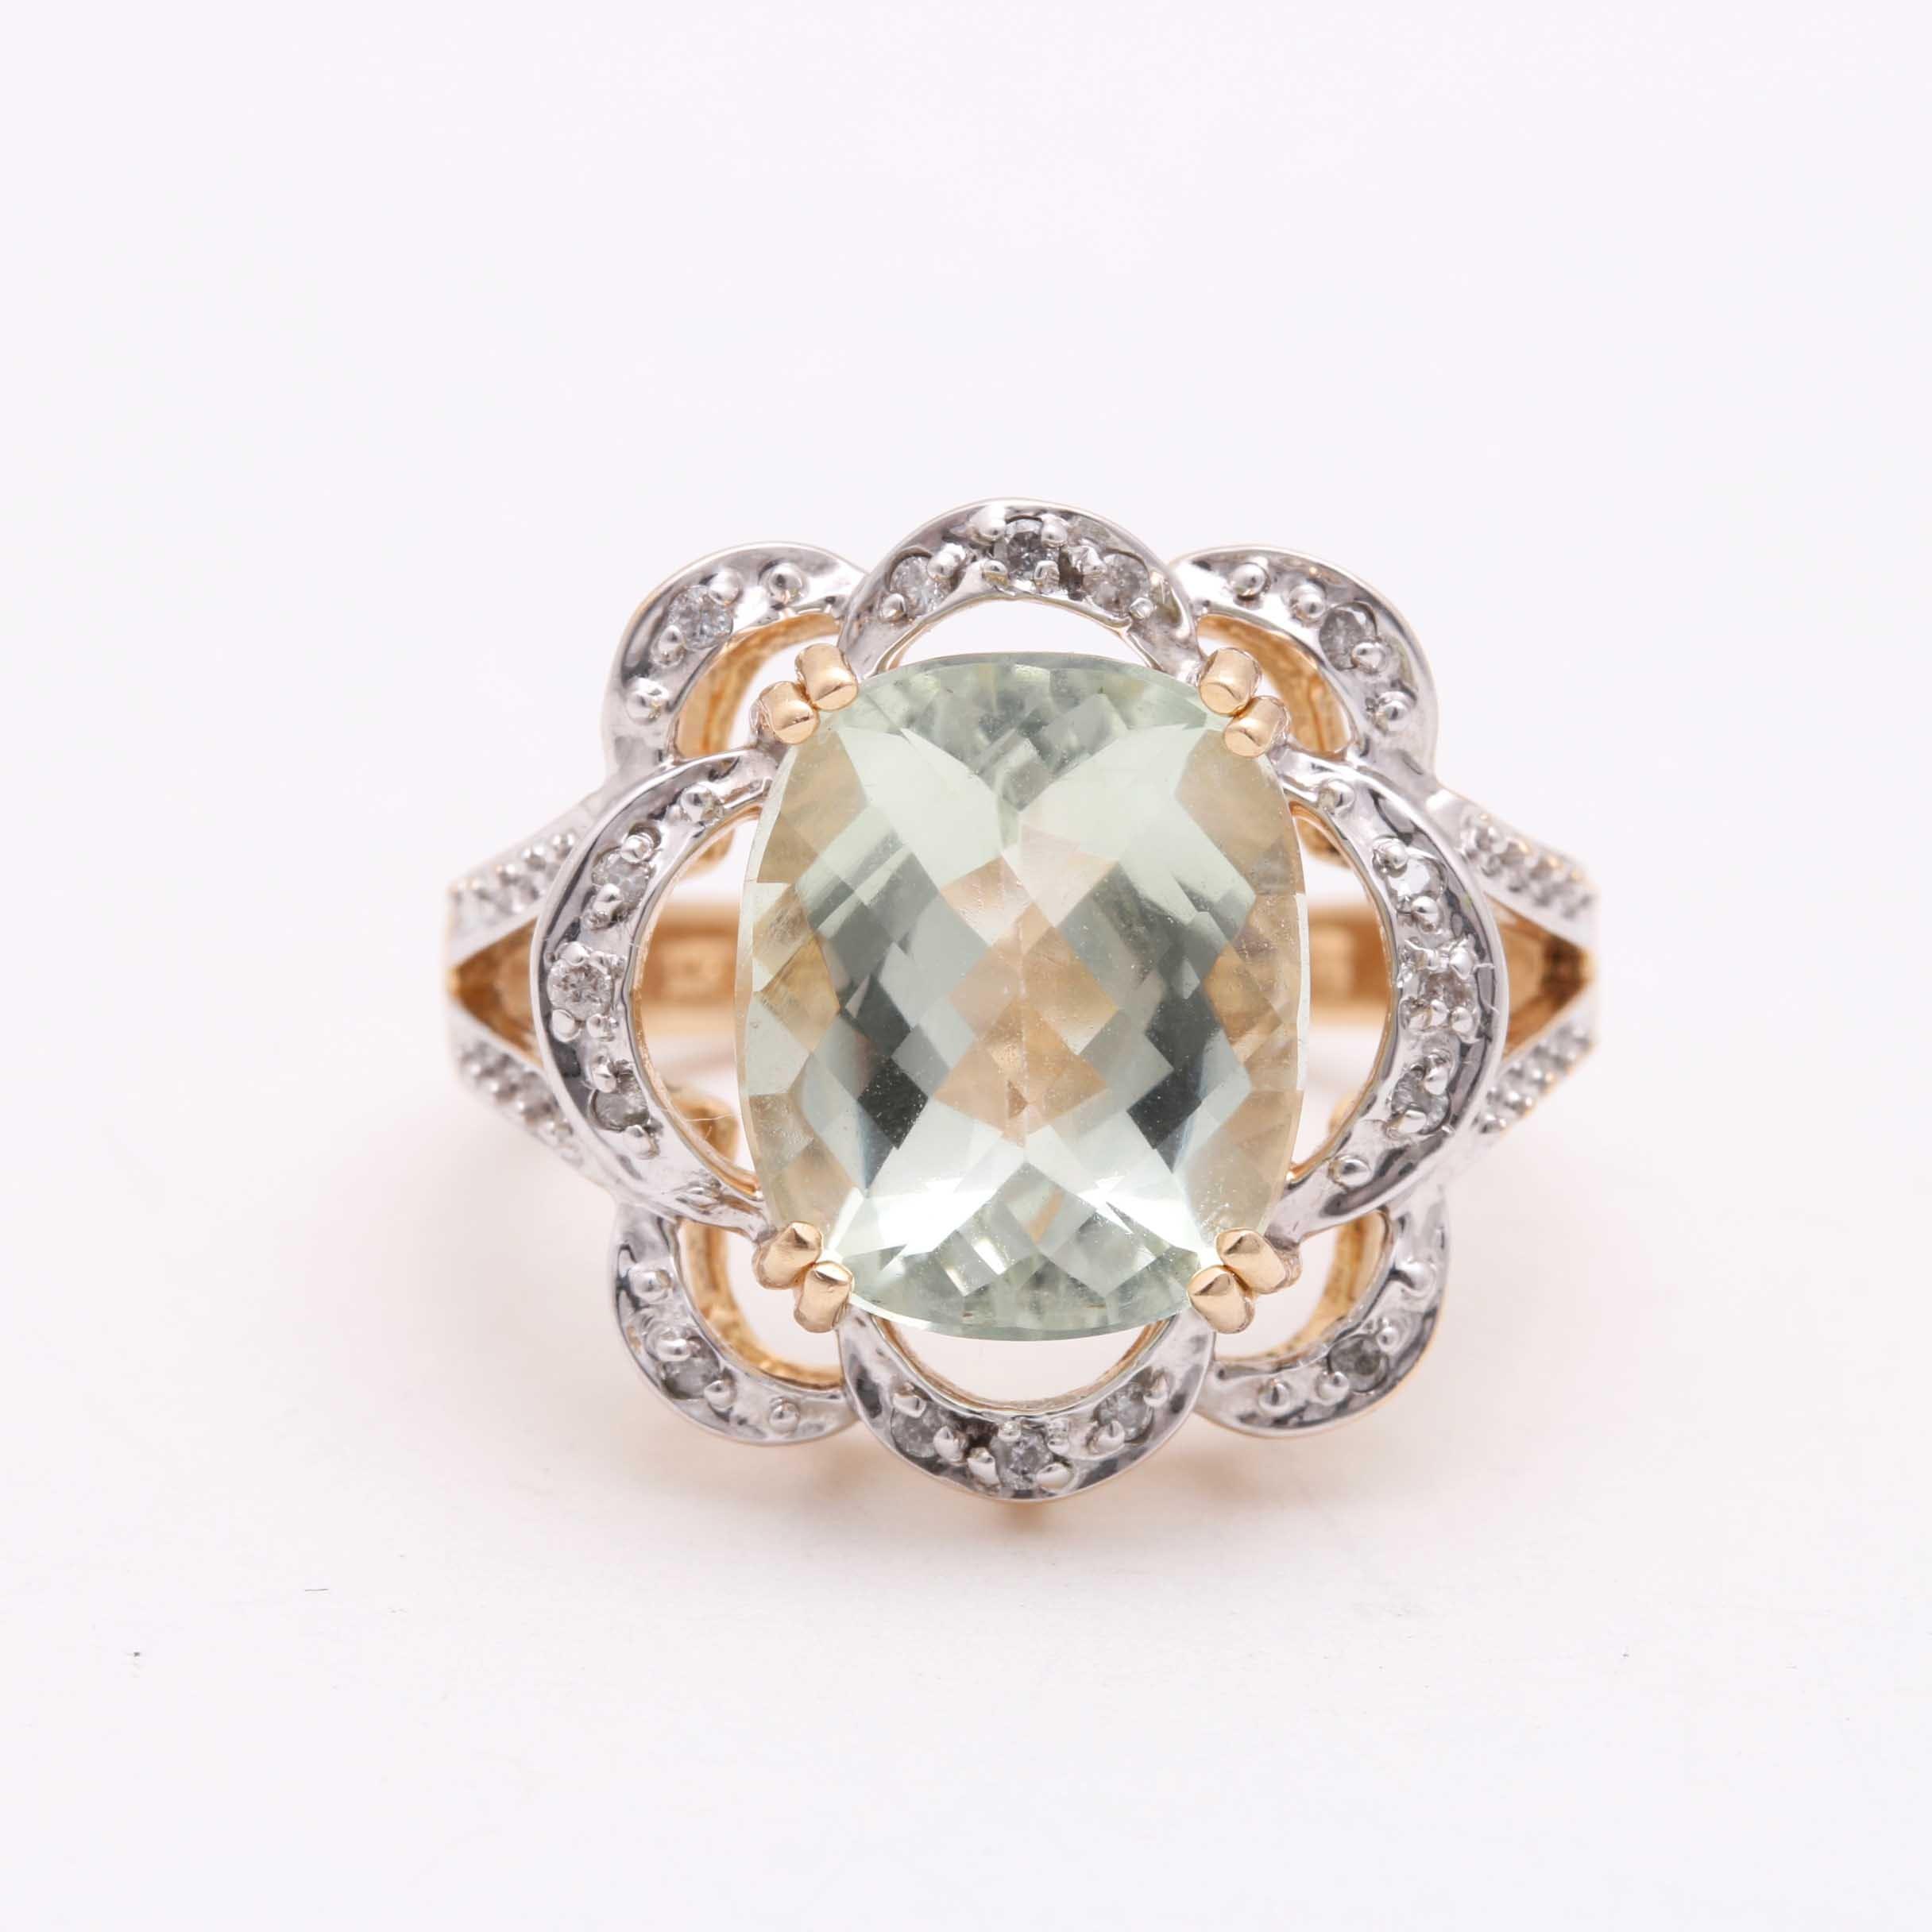 14K Yellow Gold Praseolite and Diamond Ring